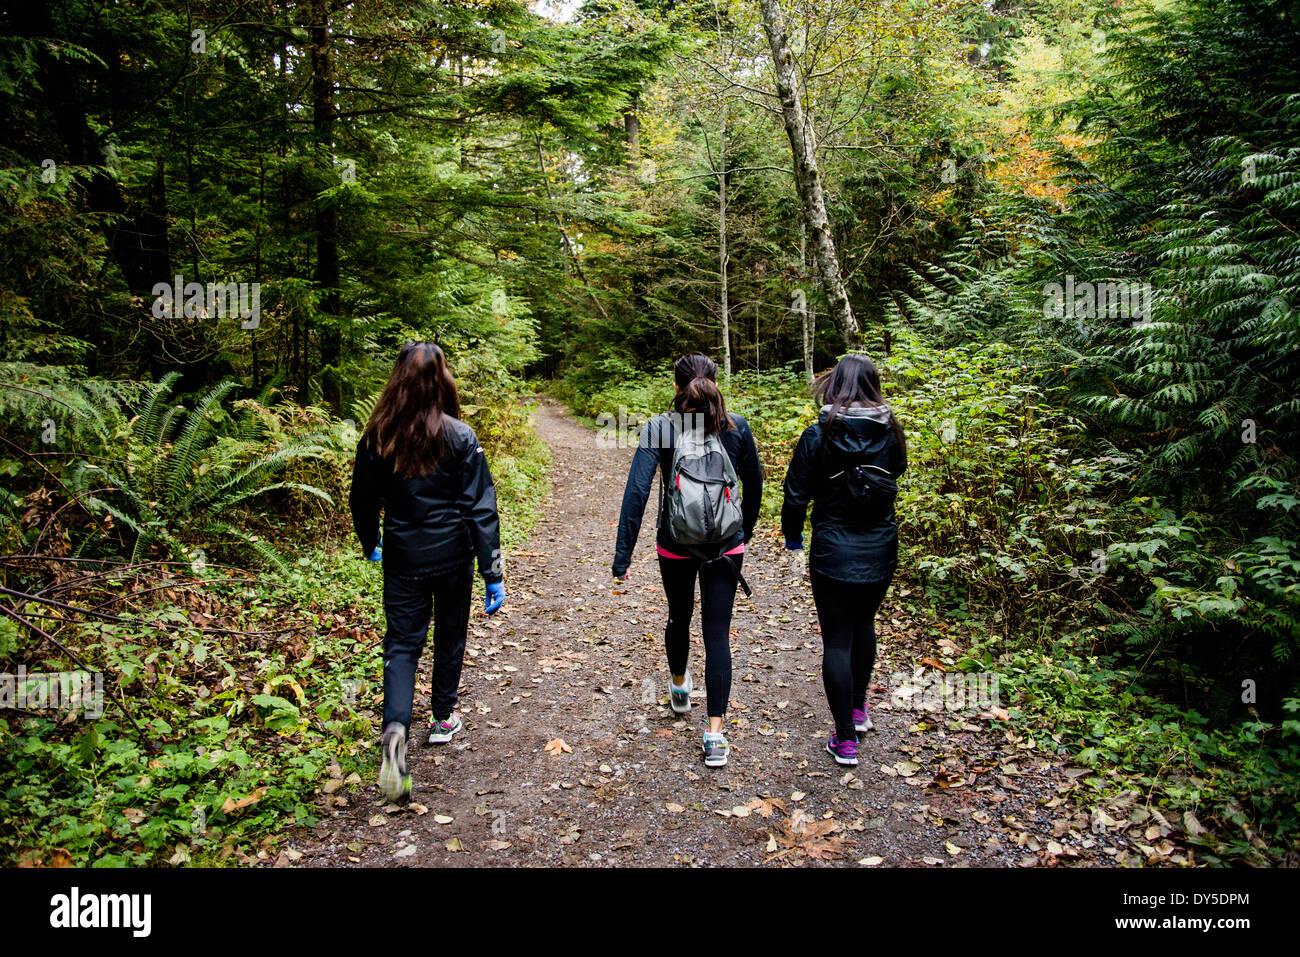 Three young female hikers walking through wood, Squamish, British Columbia, Canada - Stock Image